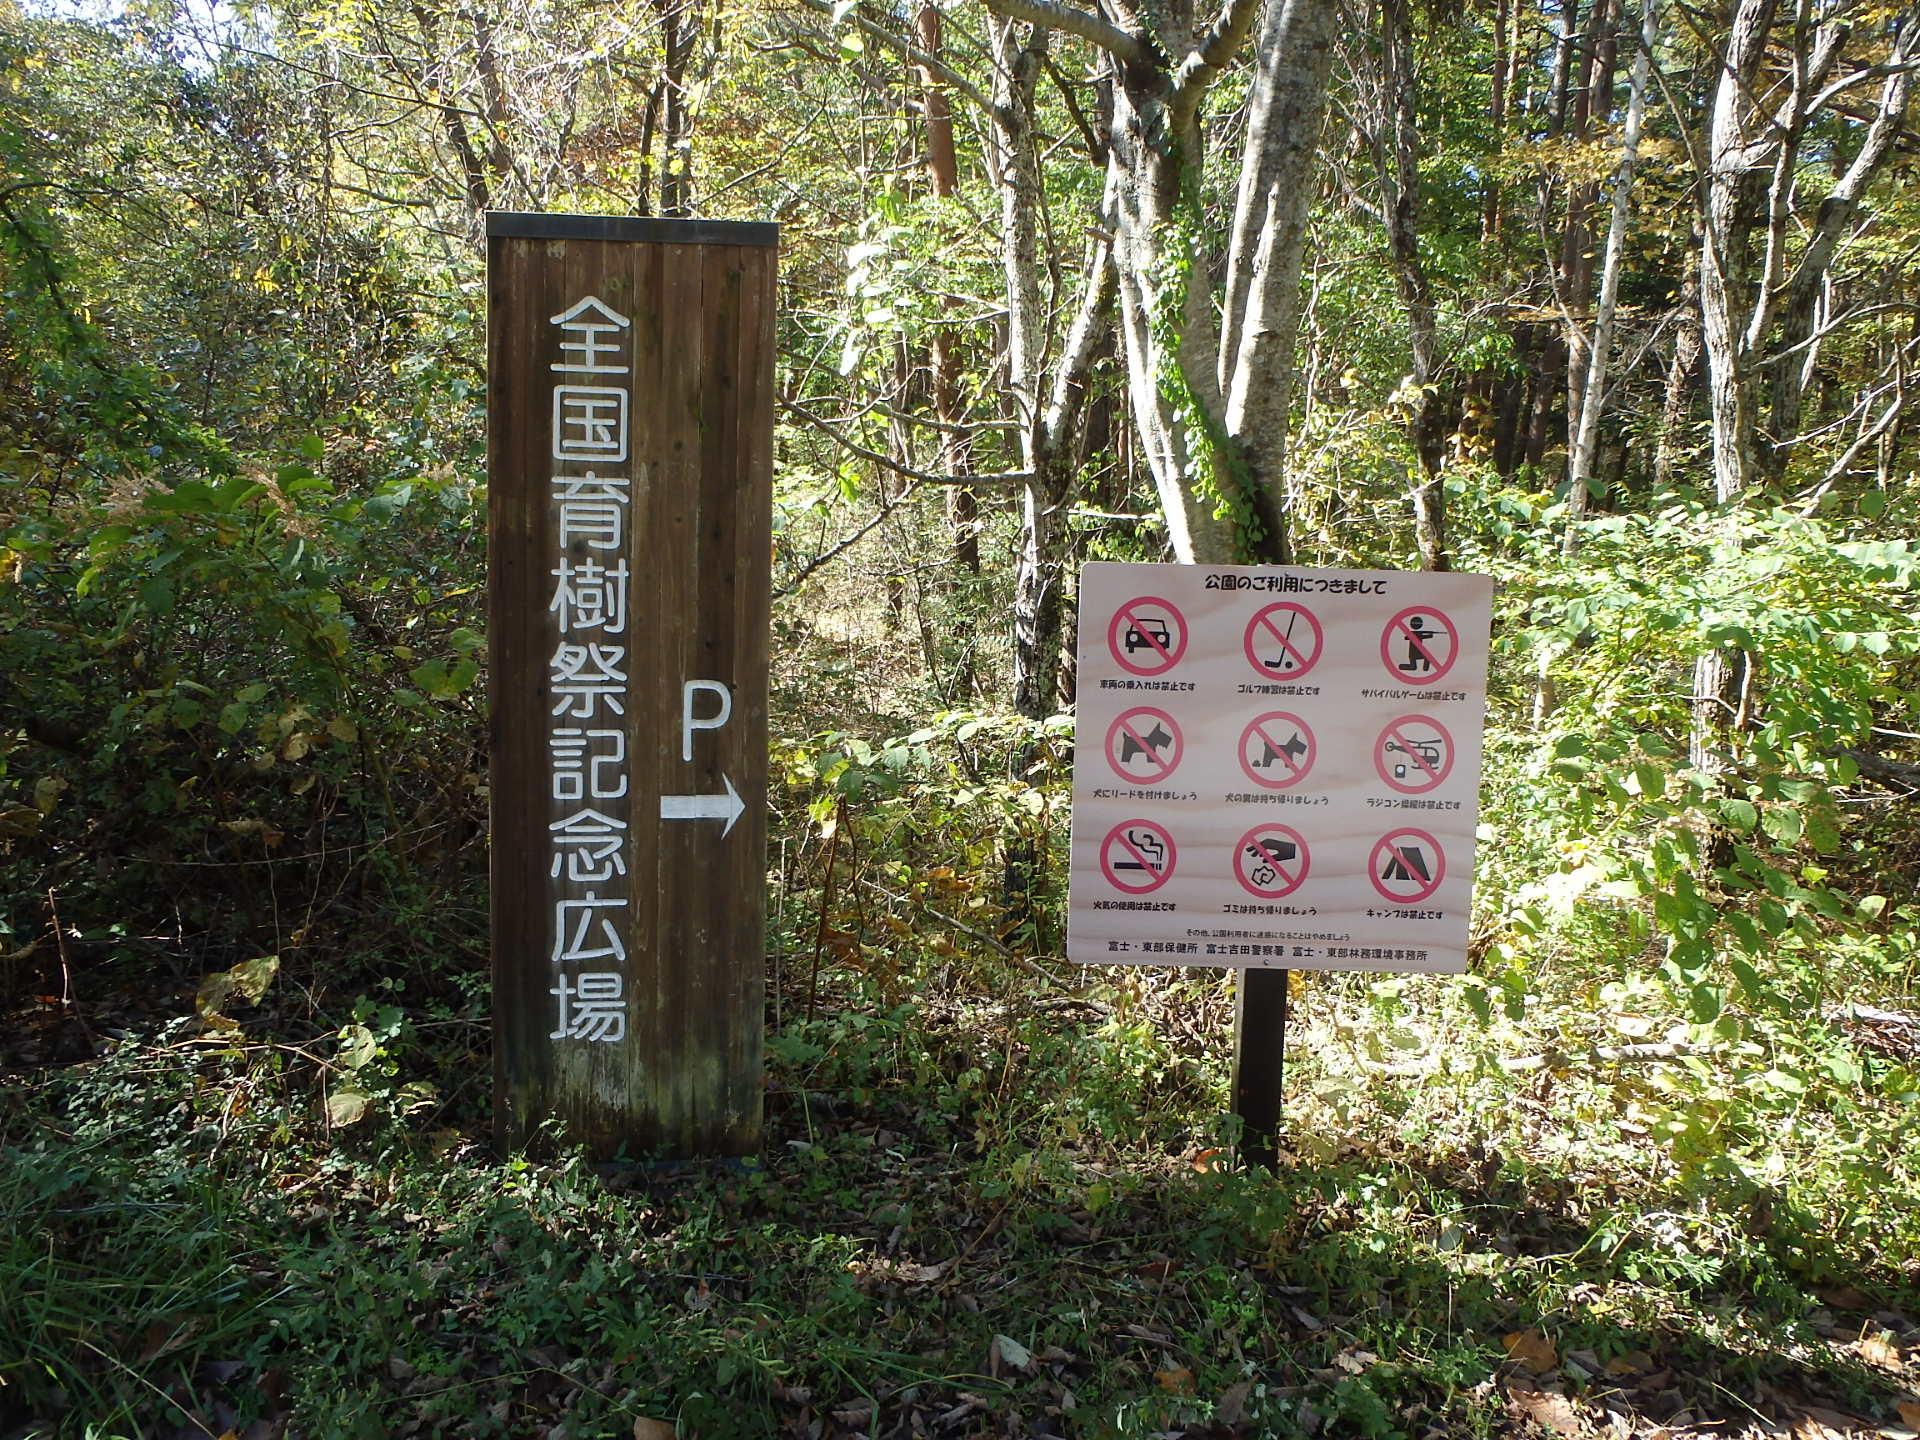 http://www.yamanashi-kankou.jp/blog/L43T9j_4.jpg